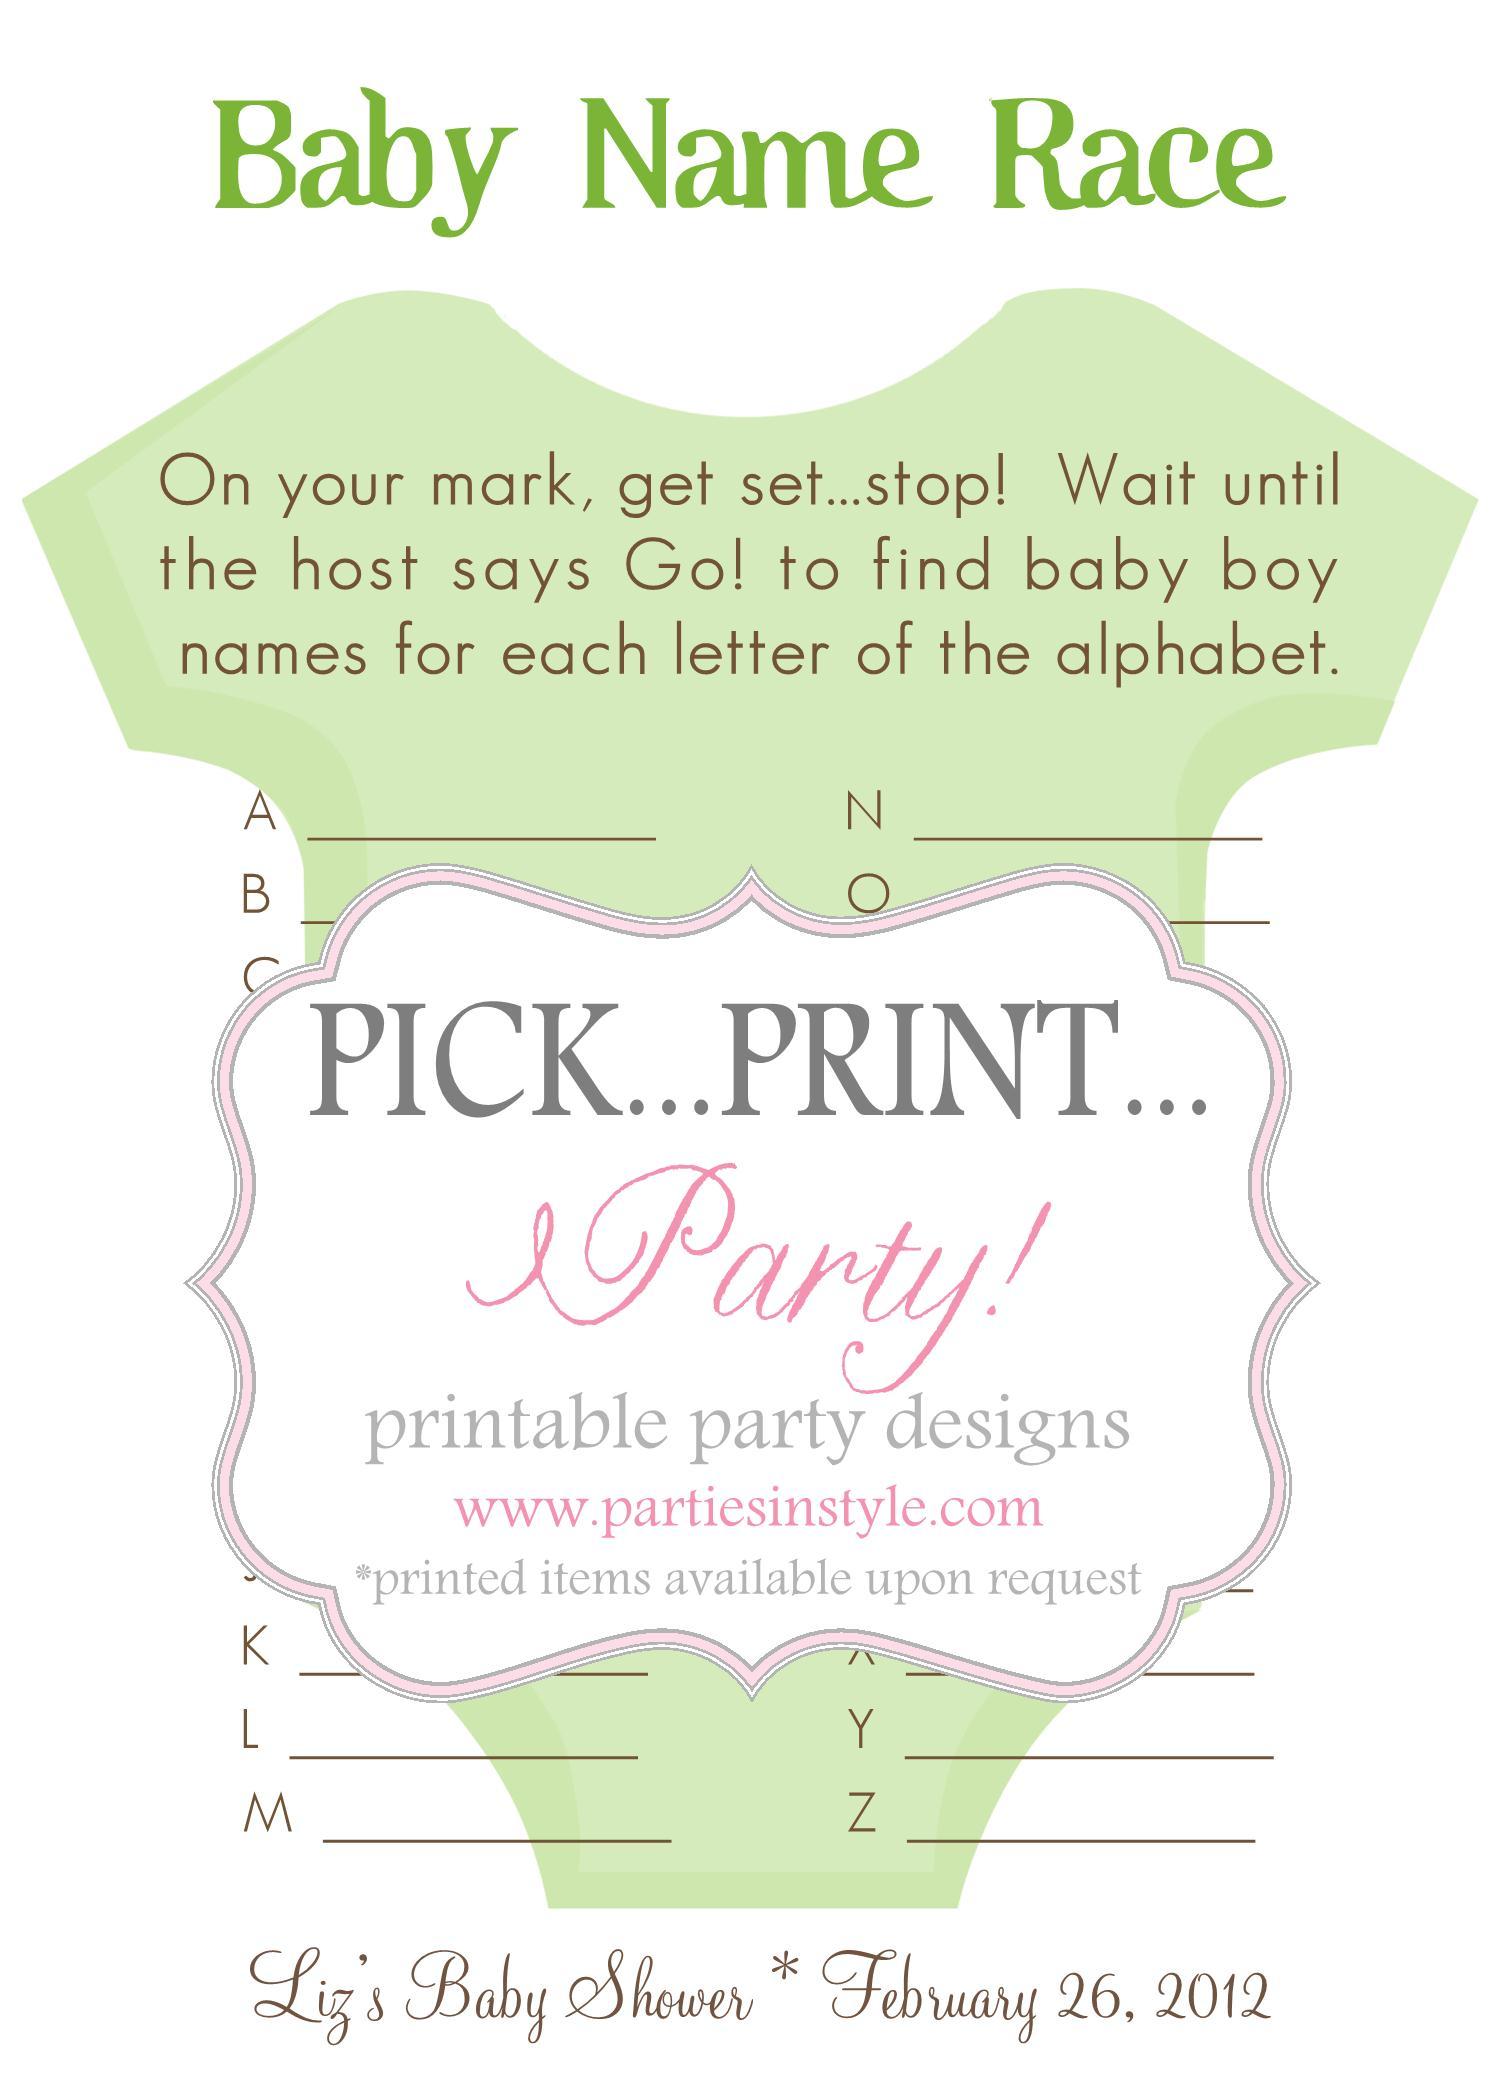 Baby Shower Game - Baby Name Race - Printable DIY on Luulla